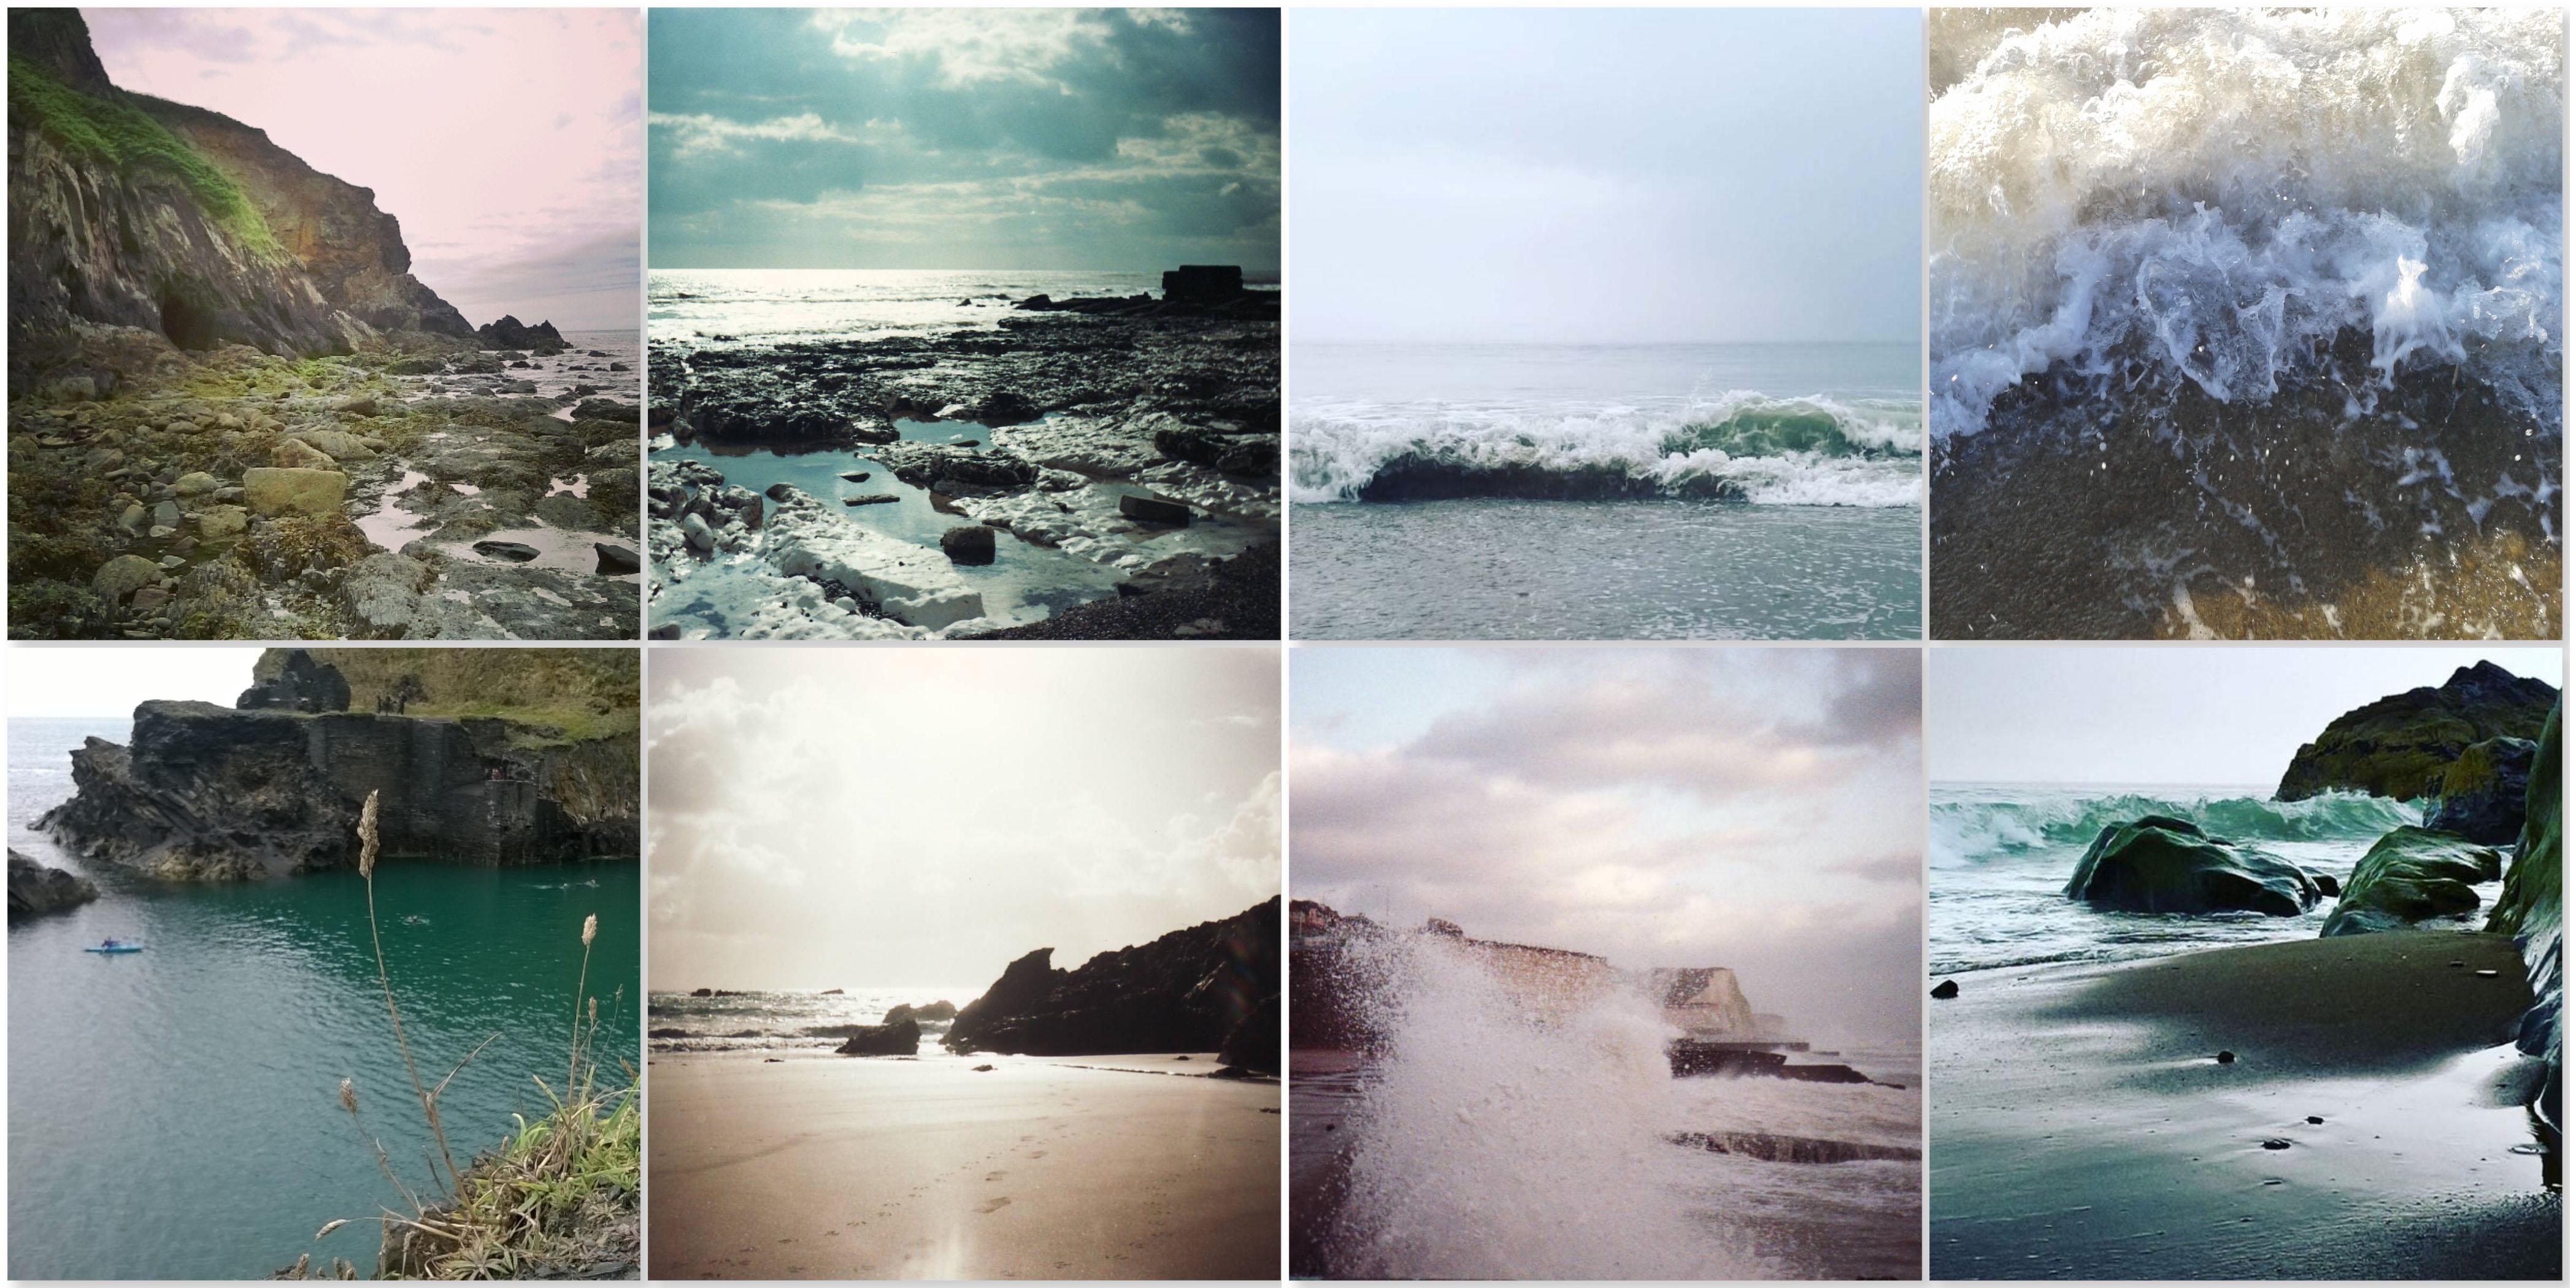 Beauty-and-Waves-The-Last-Krystallos